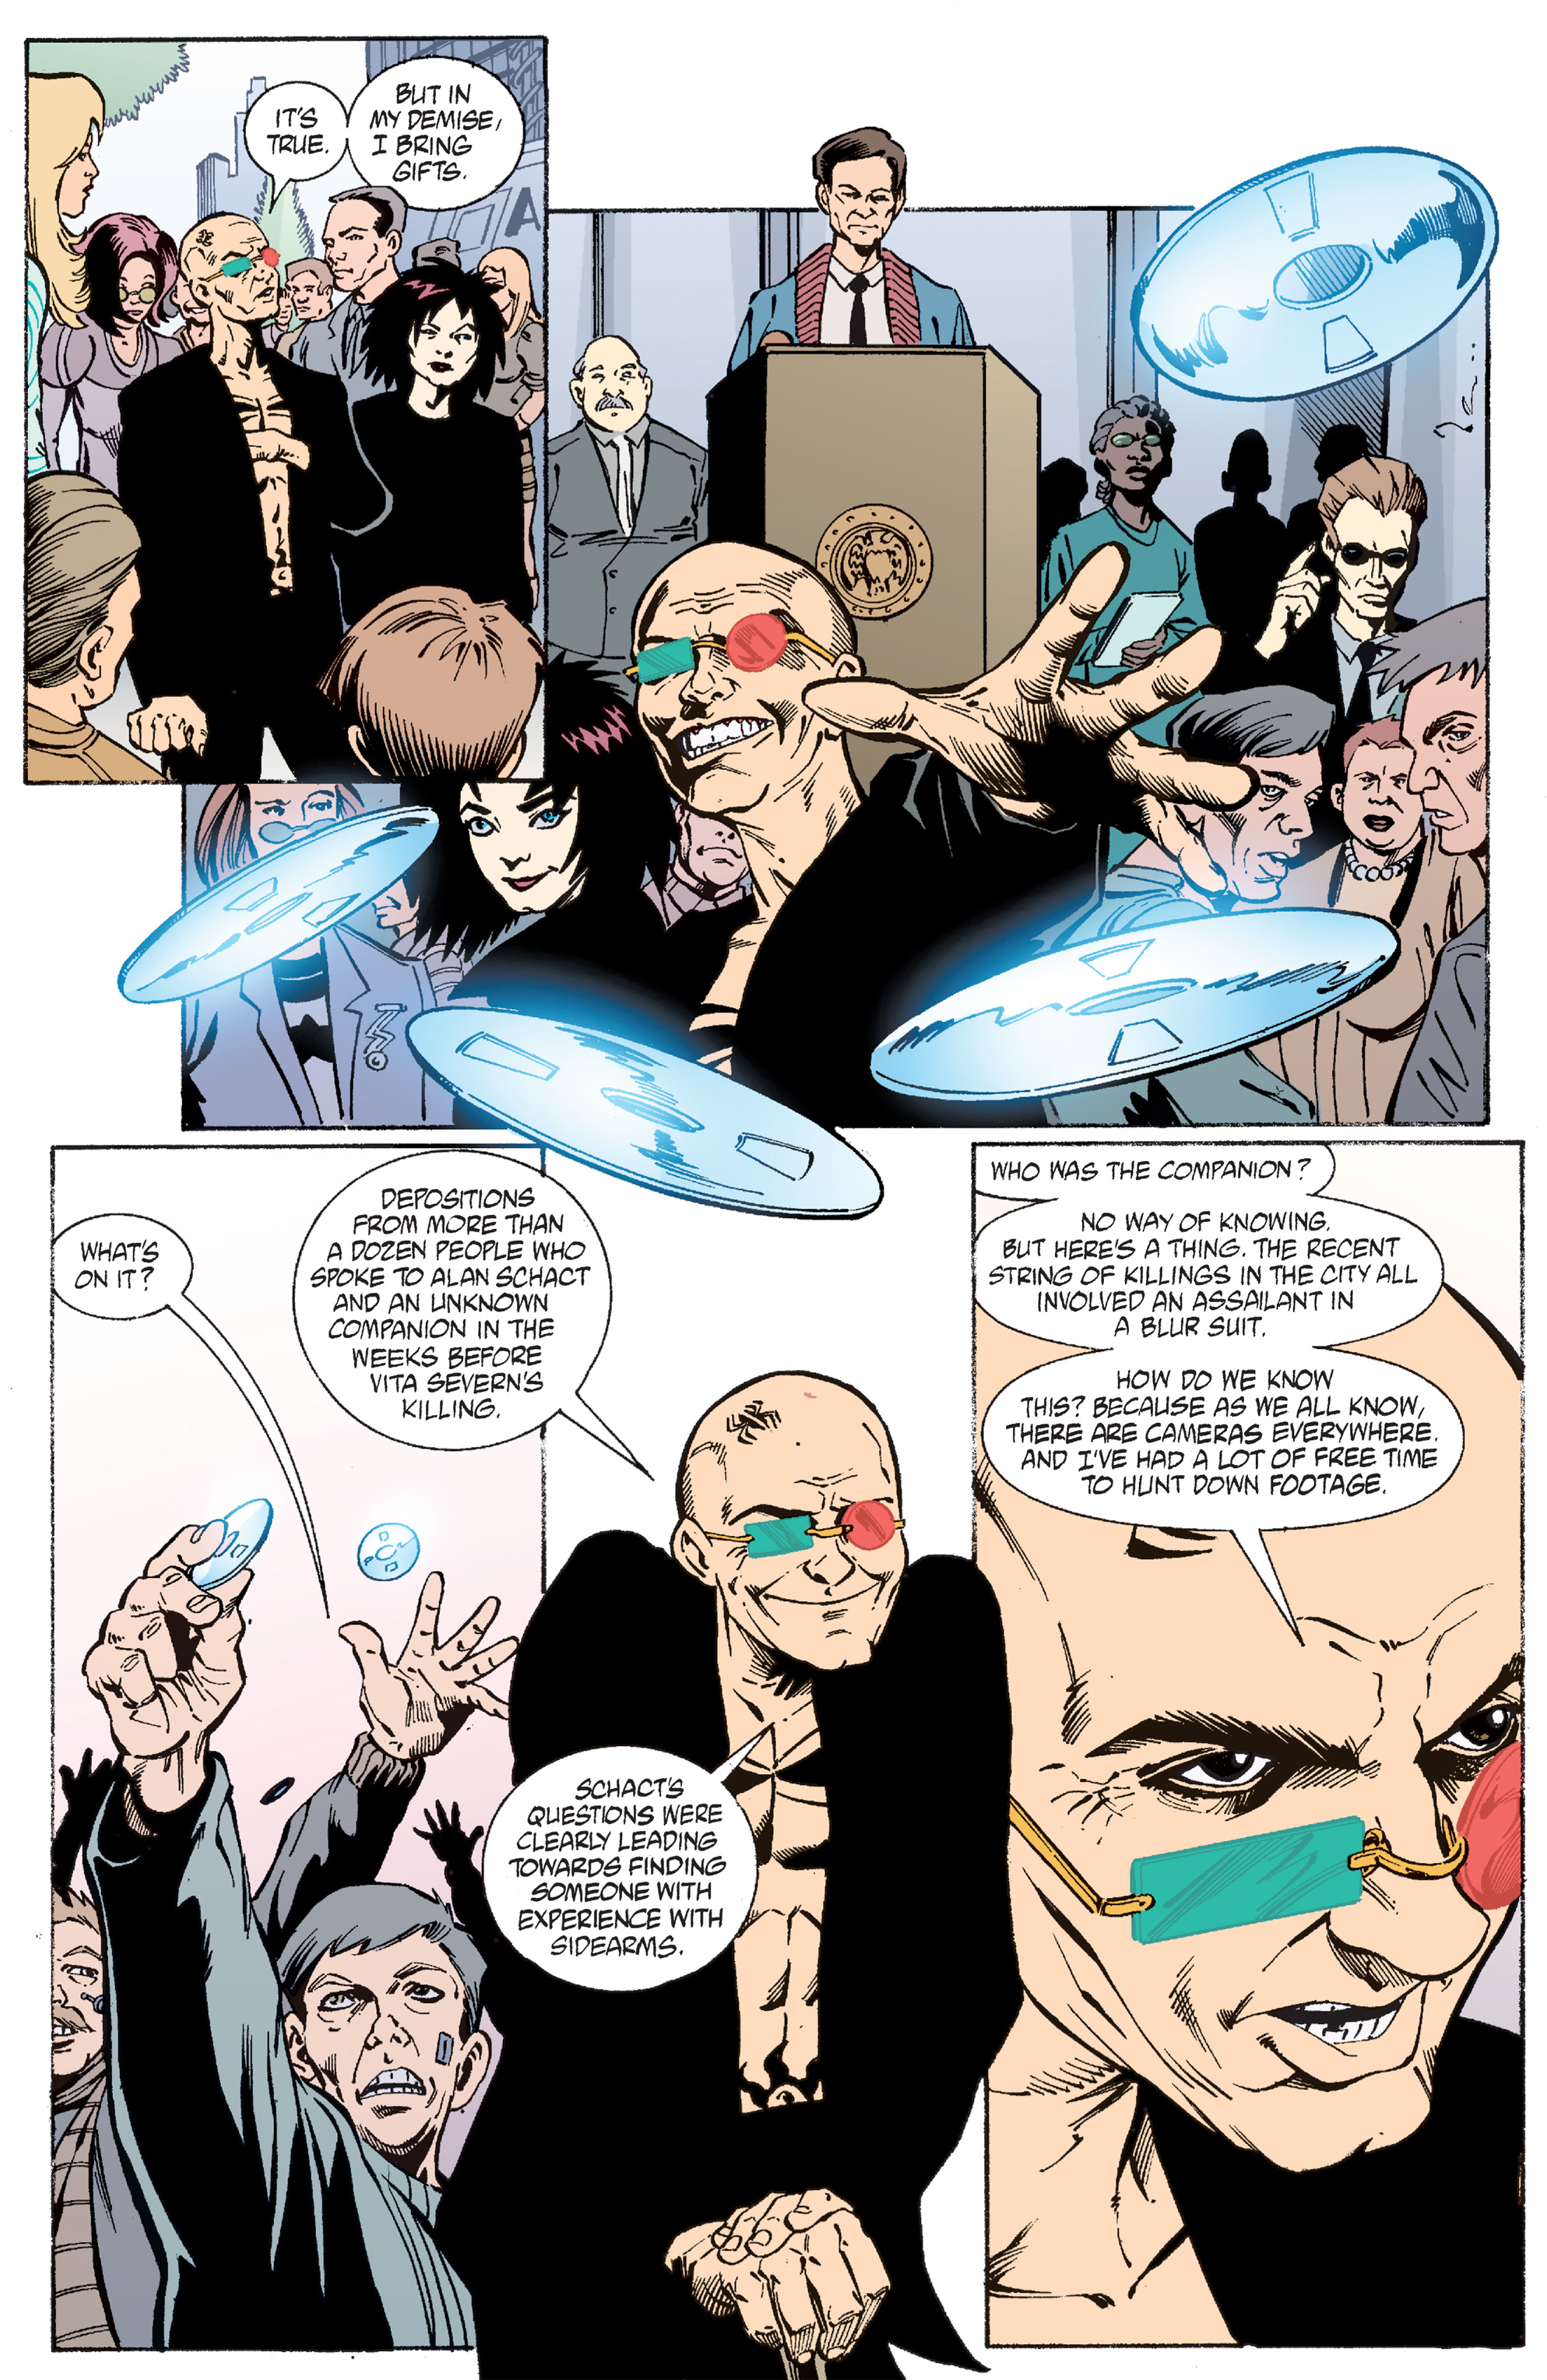 Read online Transmetropolitan comic -  Issue #47 - 18